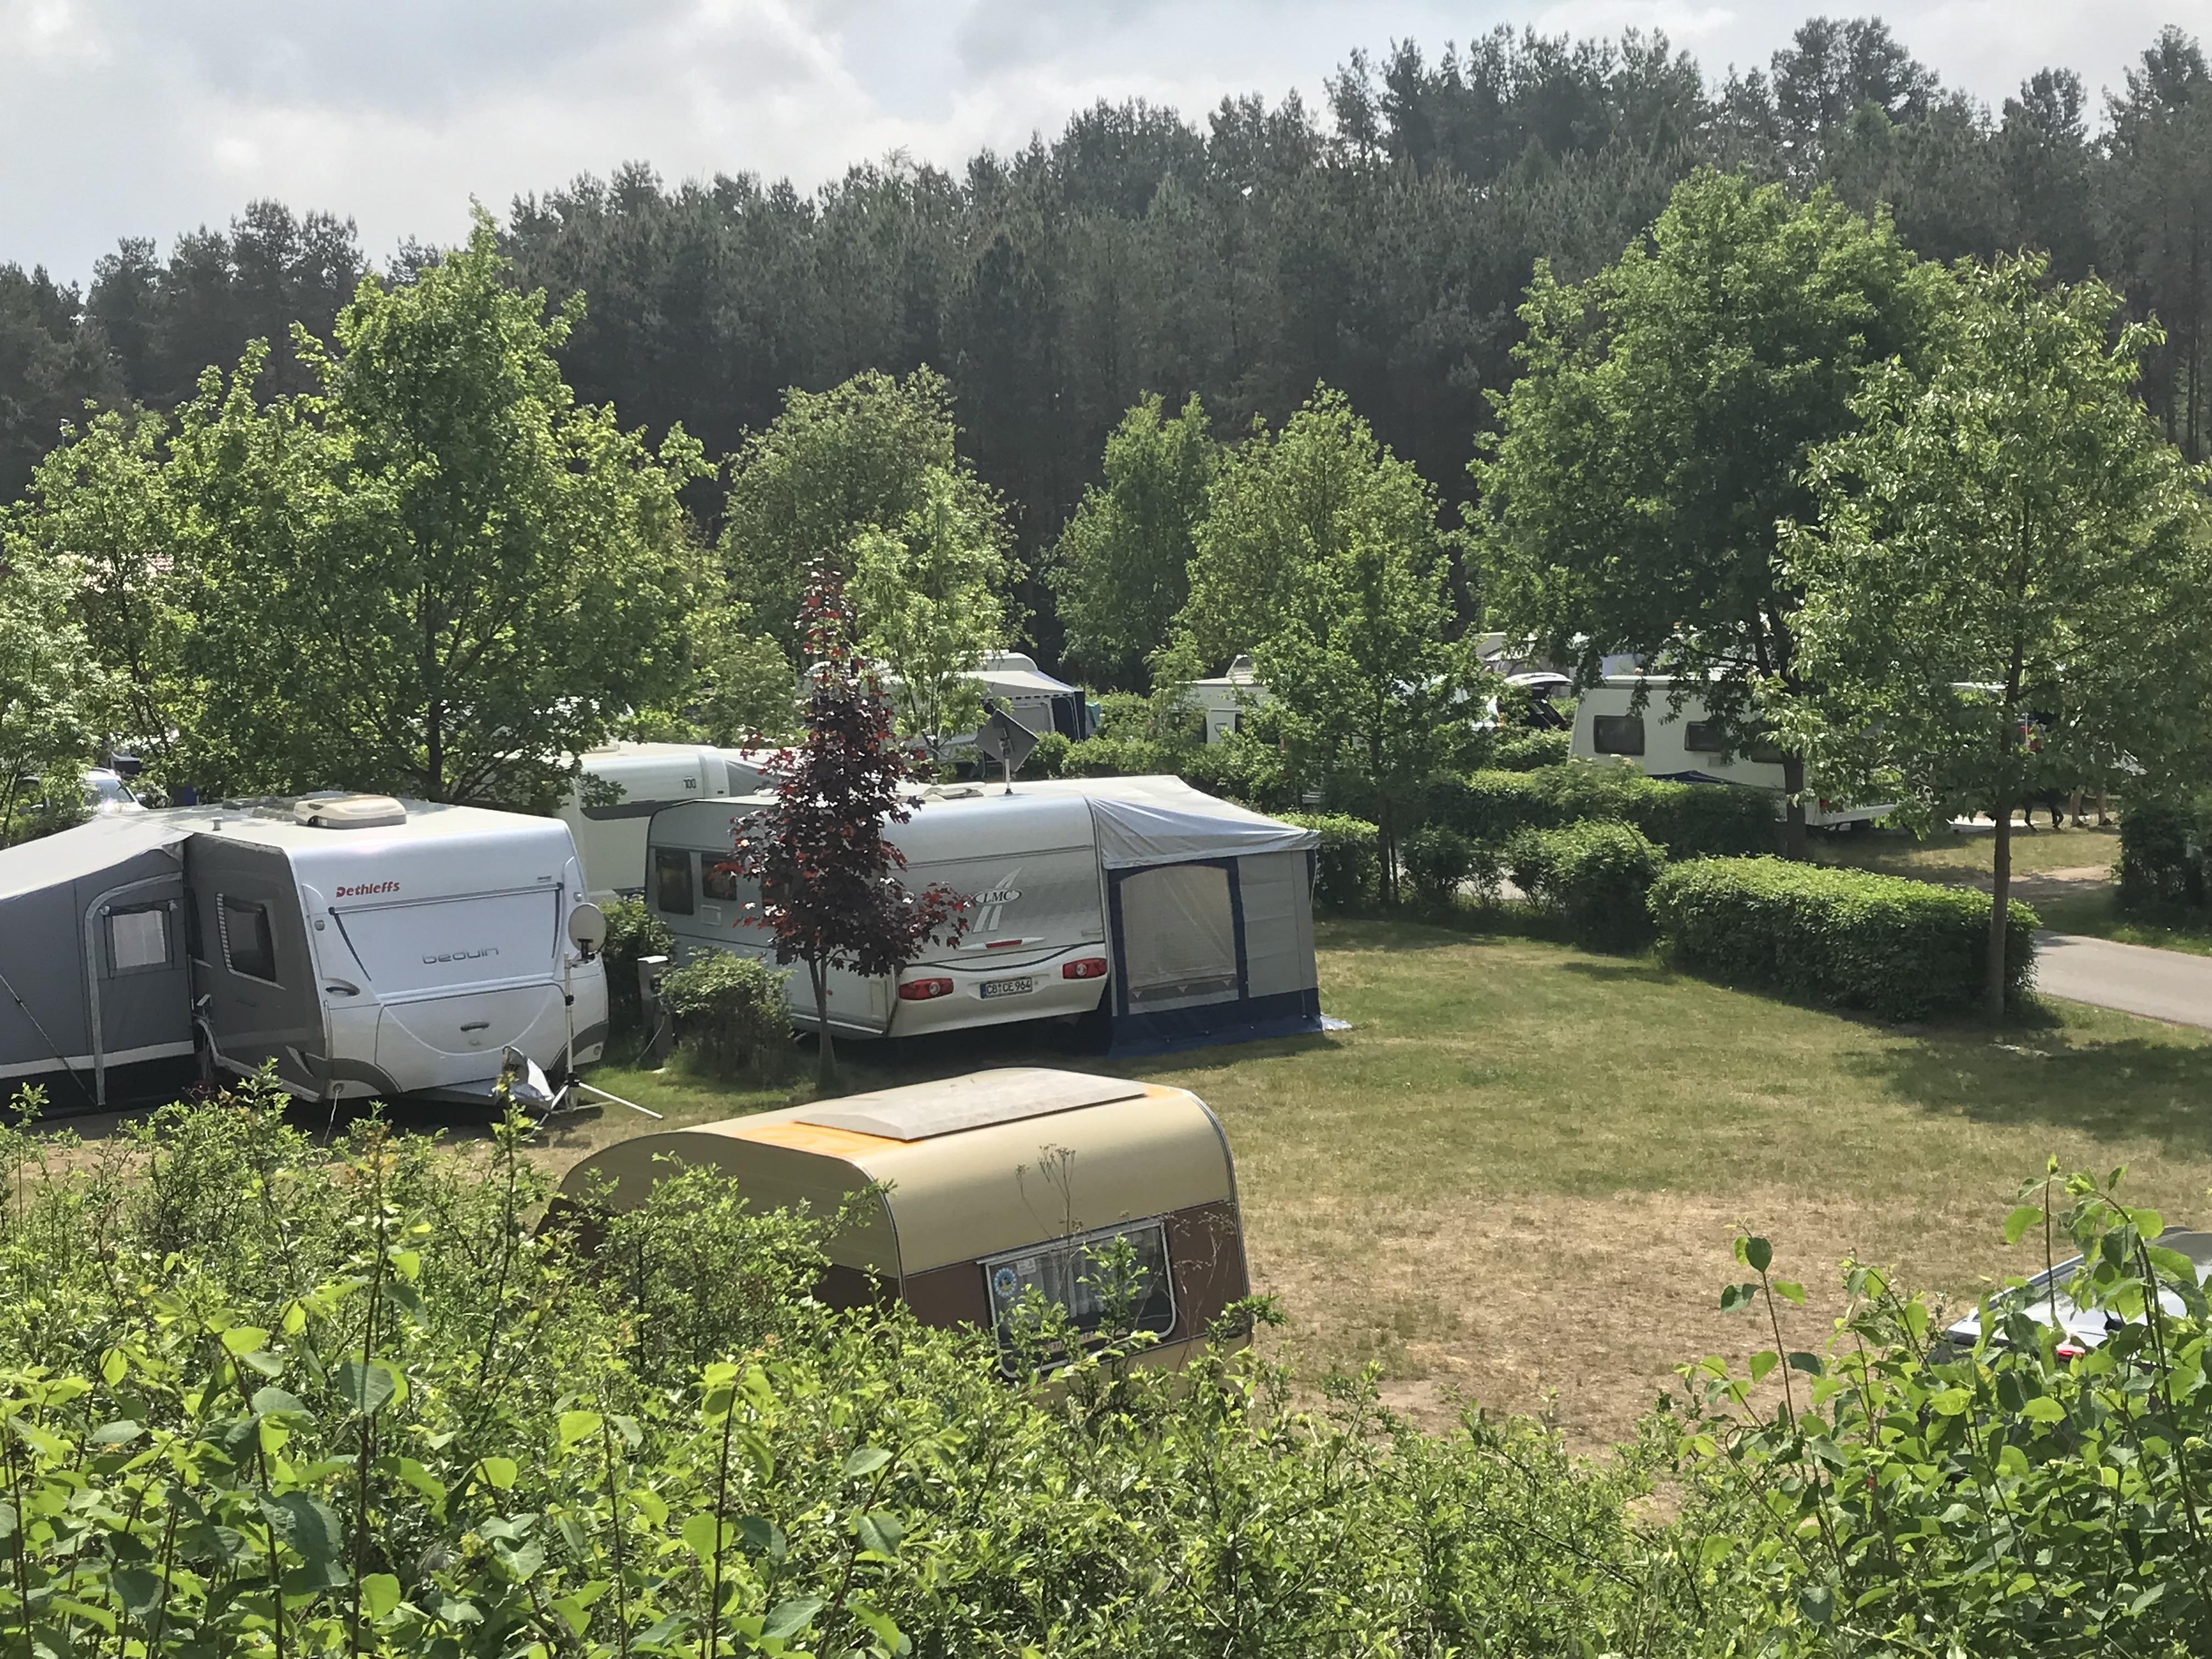 Emplacement - Empl. Camping-Car - 2 Adultes Confort - Campingpark Havelberge